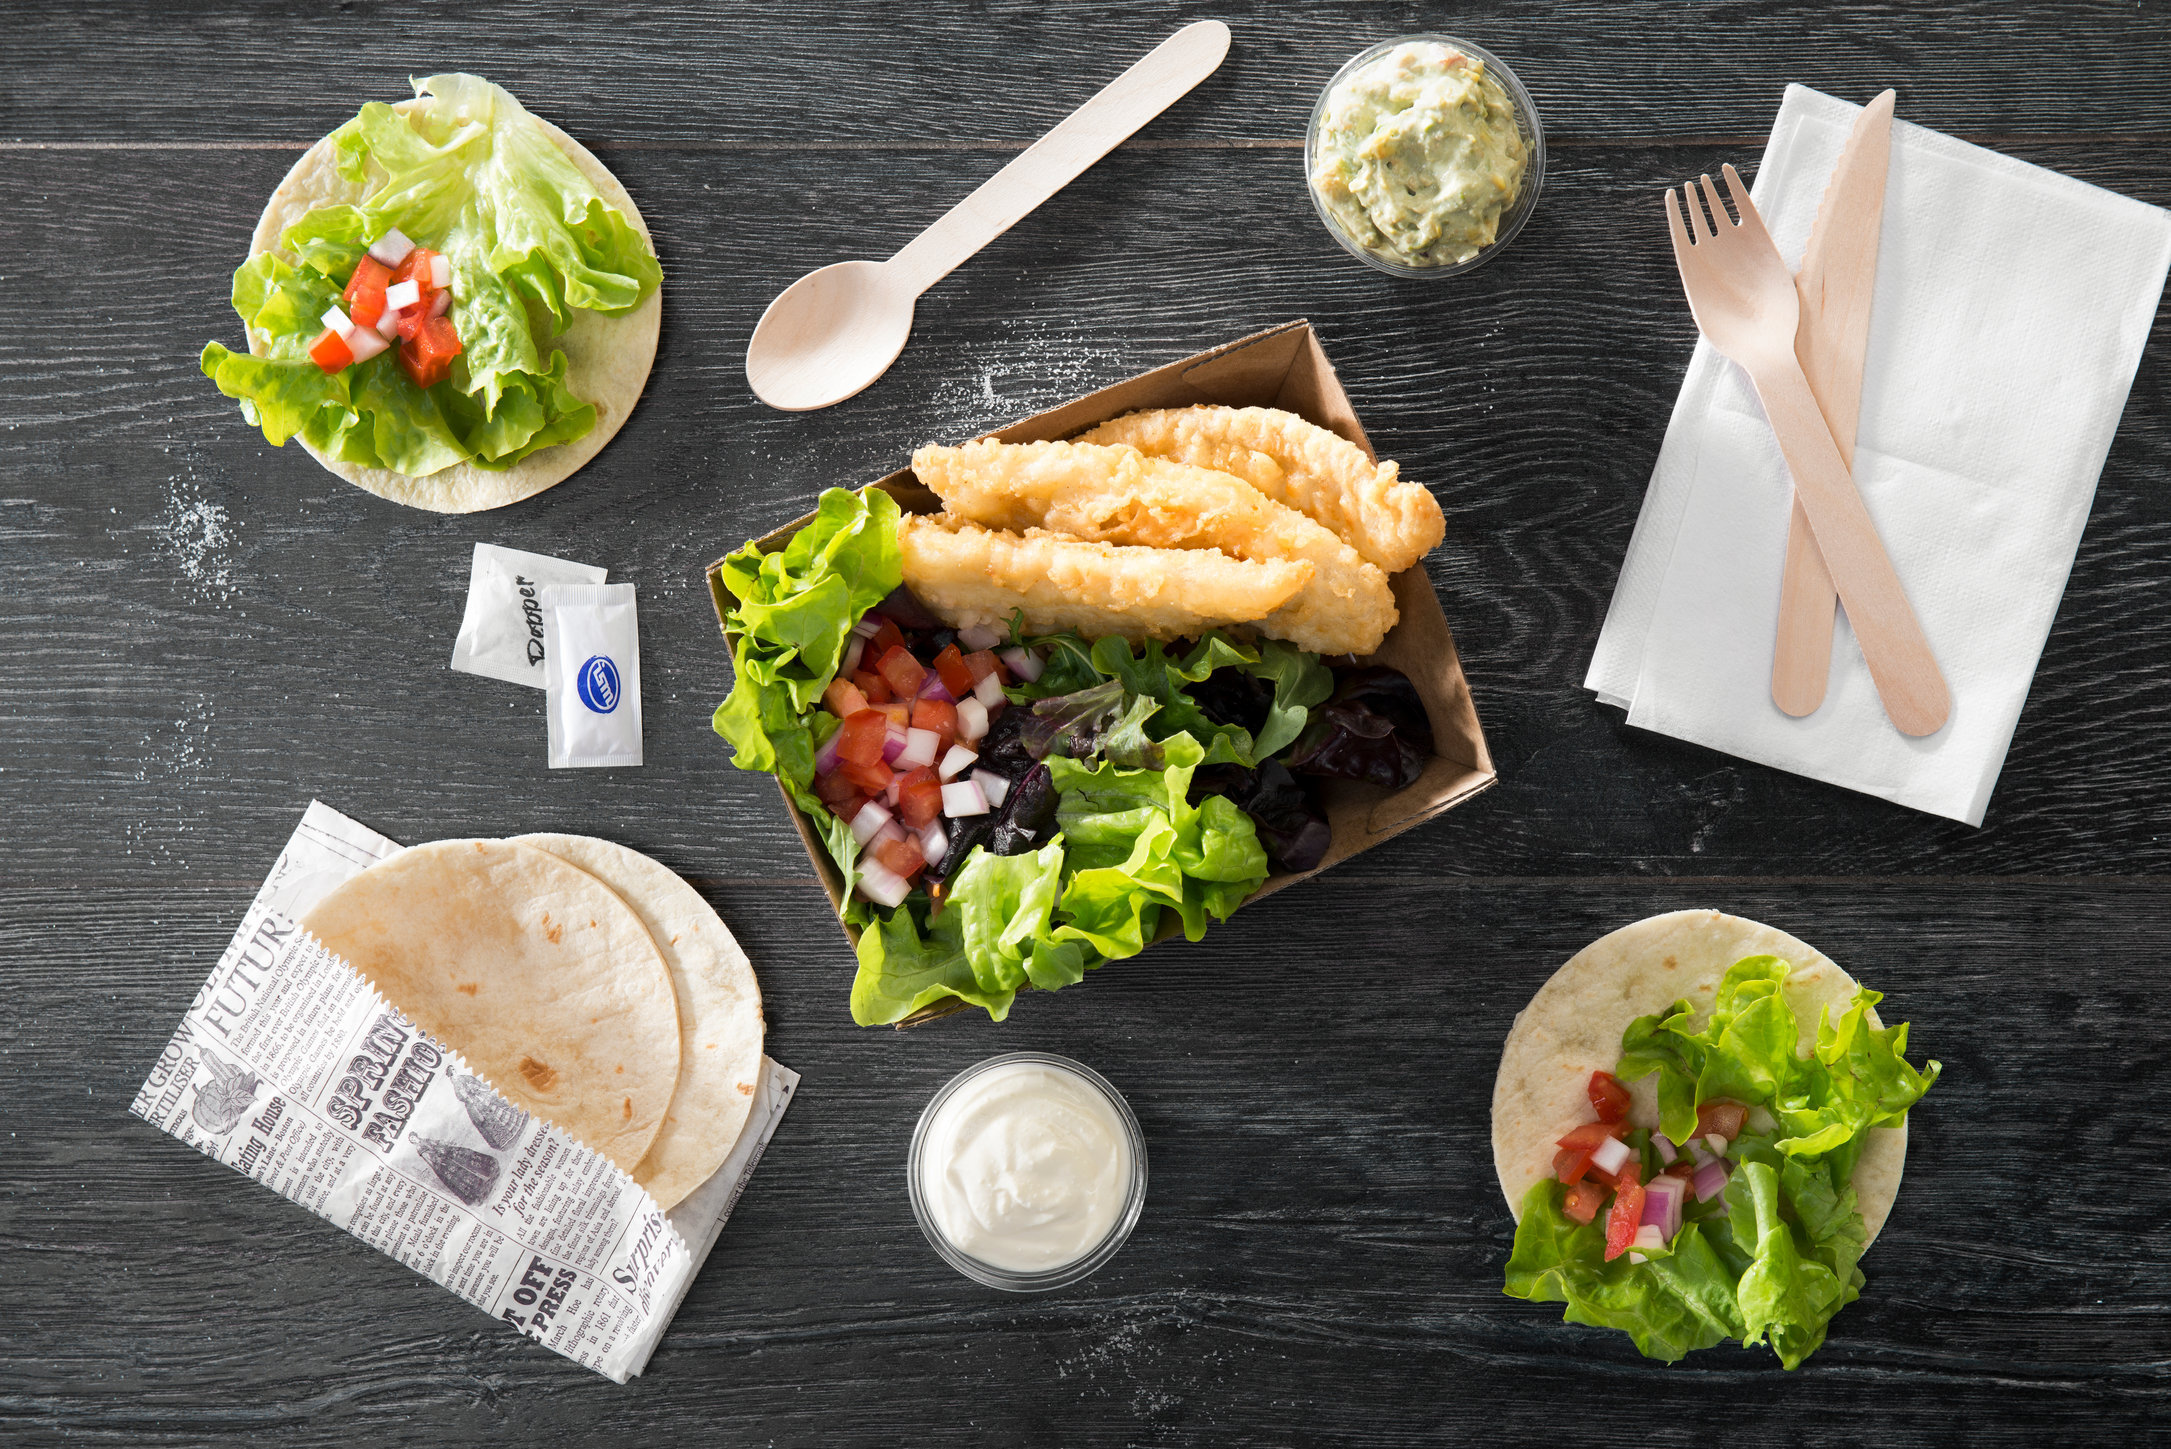 CWS Meal Deal 2.jpg